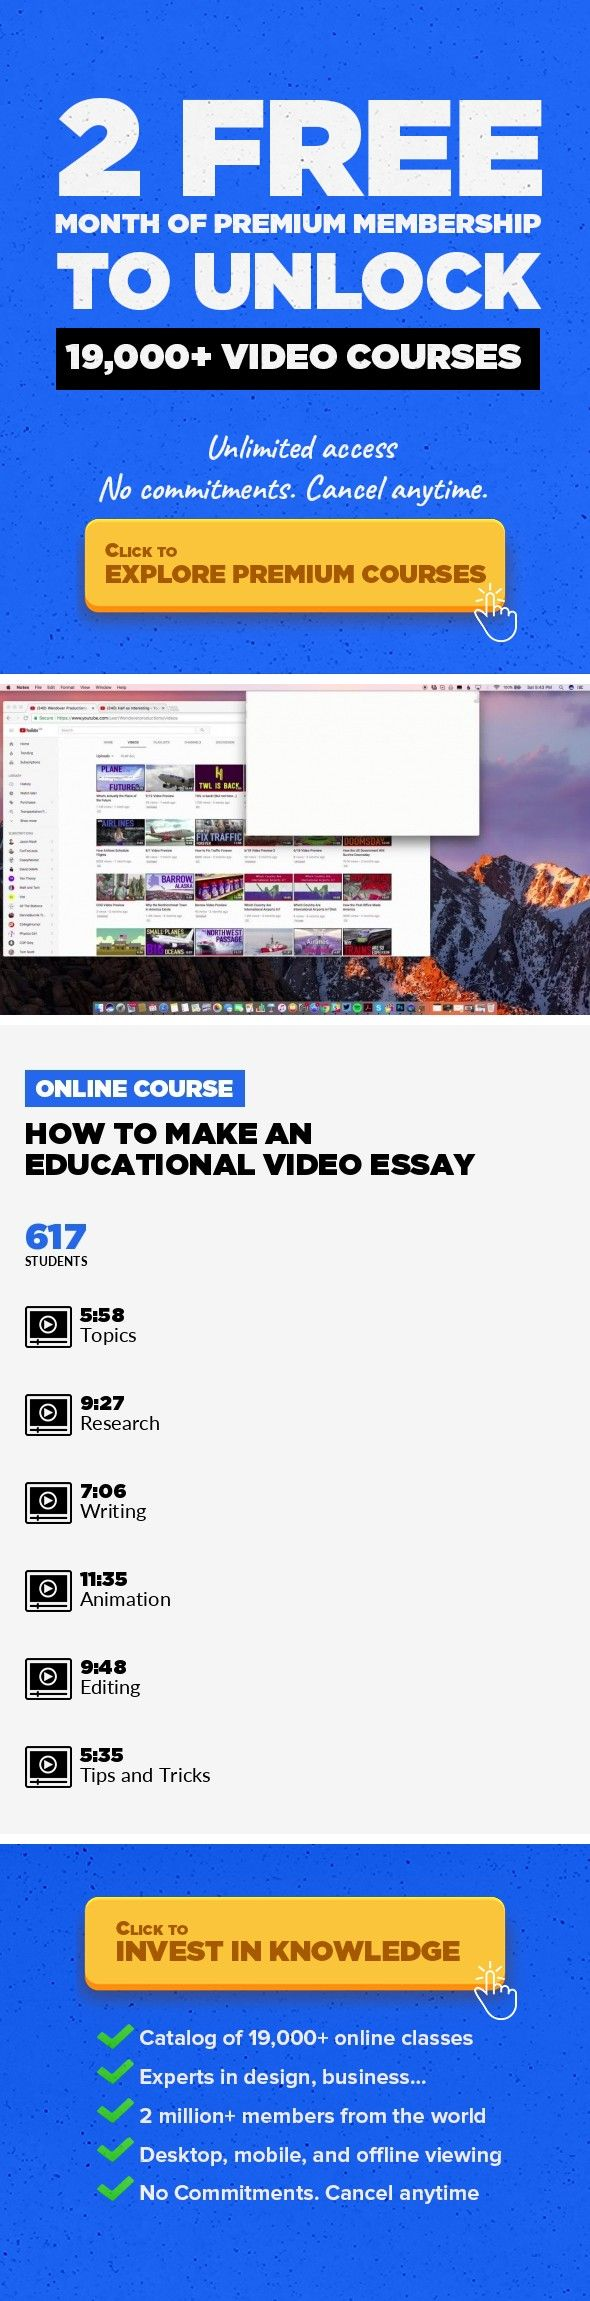 010 How To Make Video Essay Wonderful A Create Photo Using Imovie Full